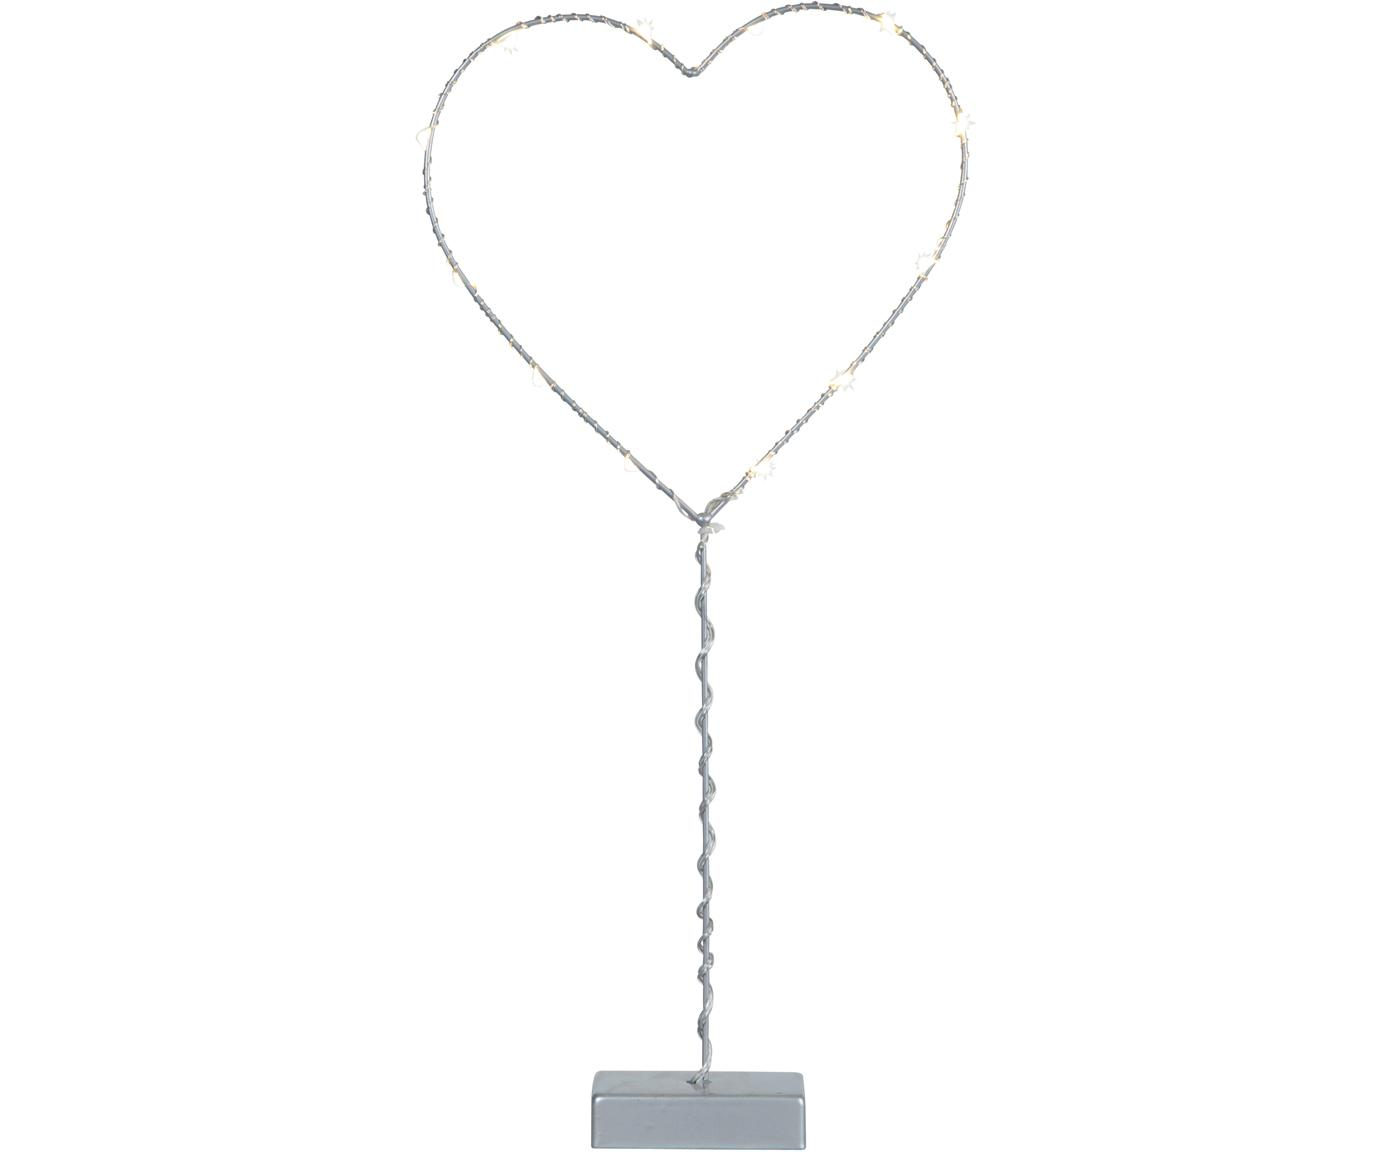 LED lichtobject Heart, batterij-aangedreven, Grijs, 20 x 43 cm